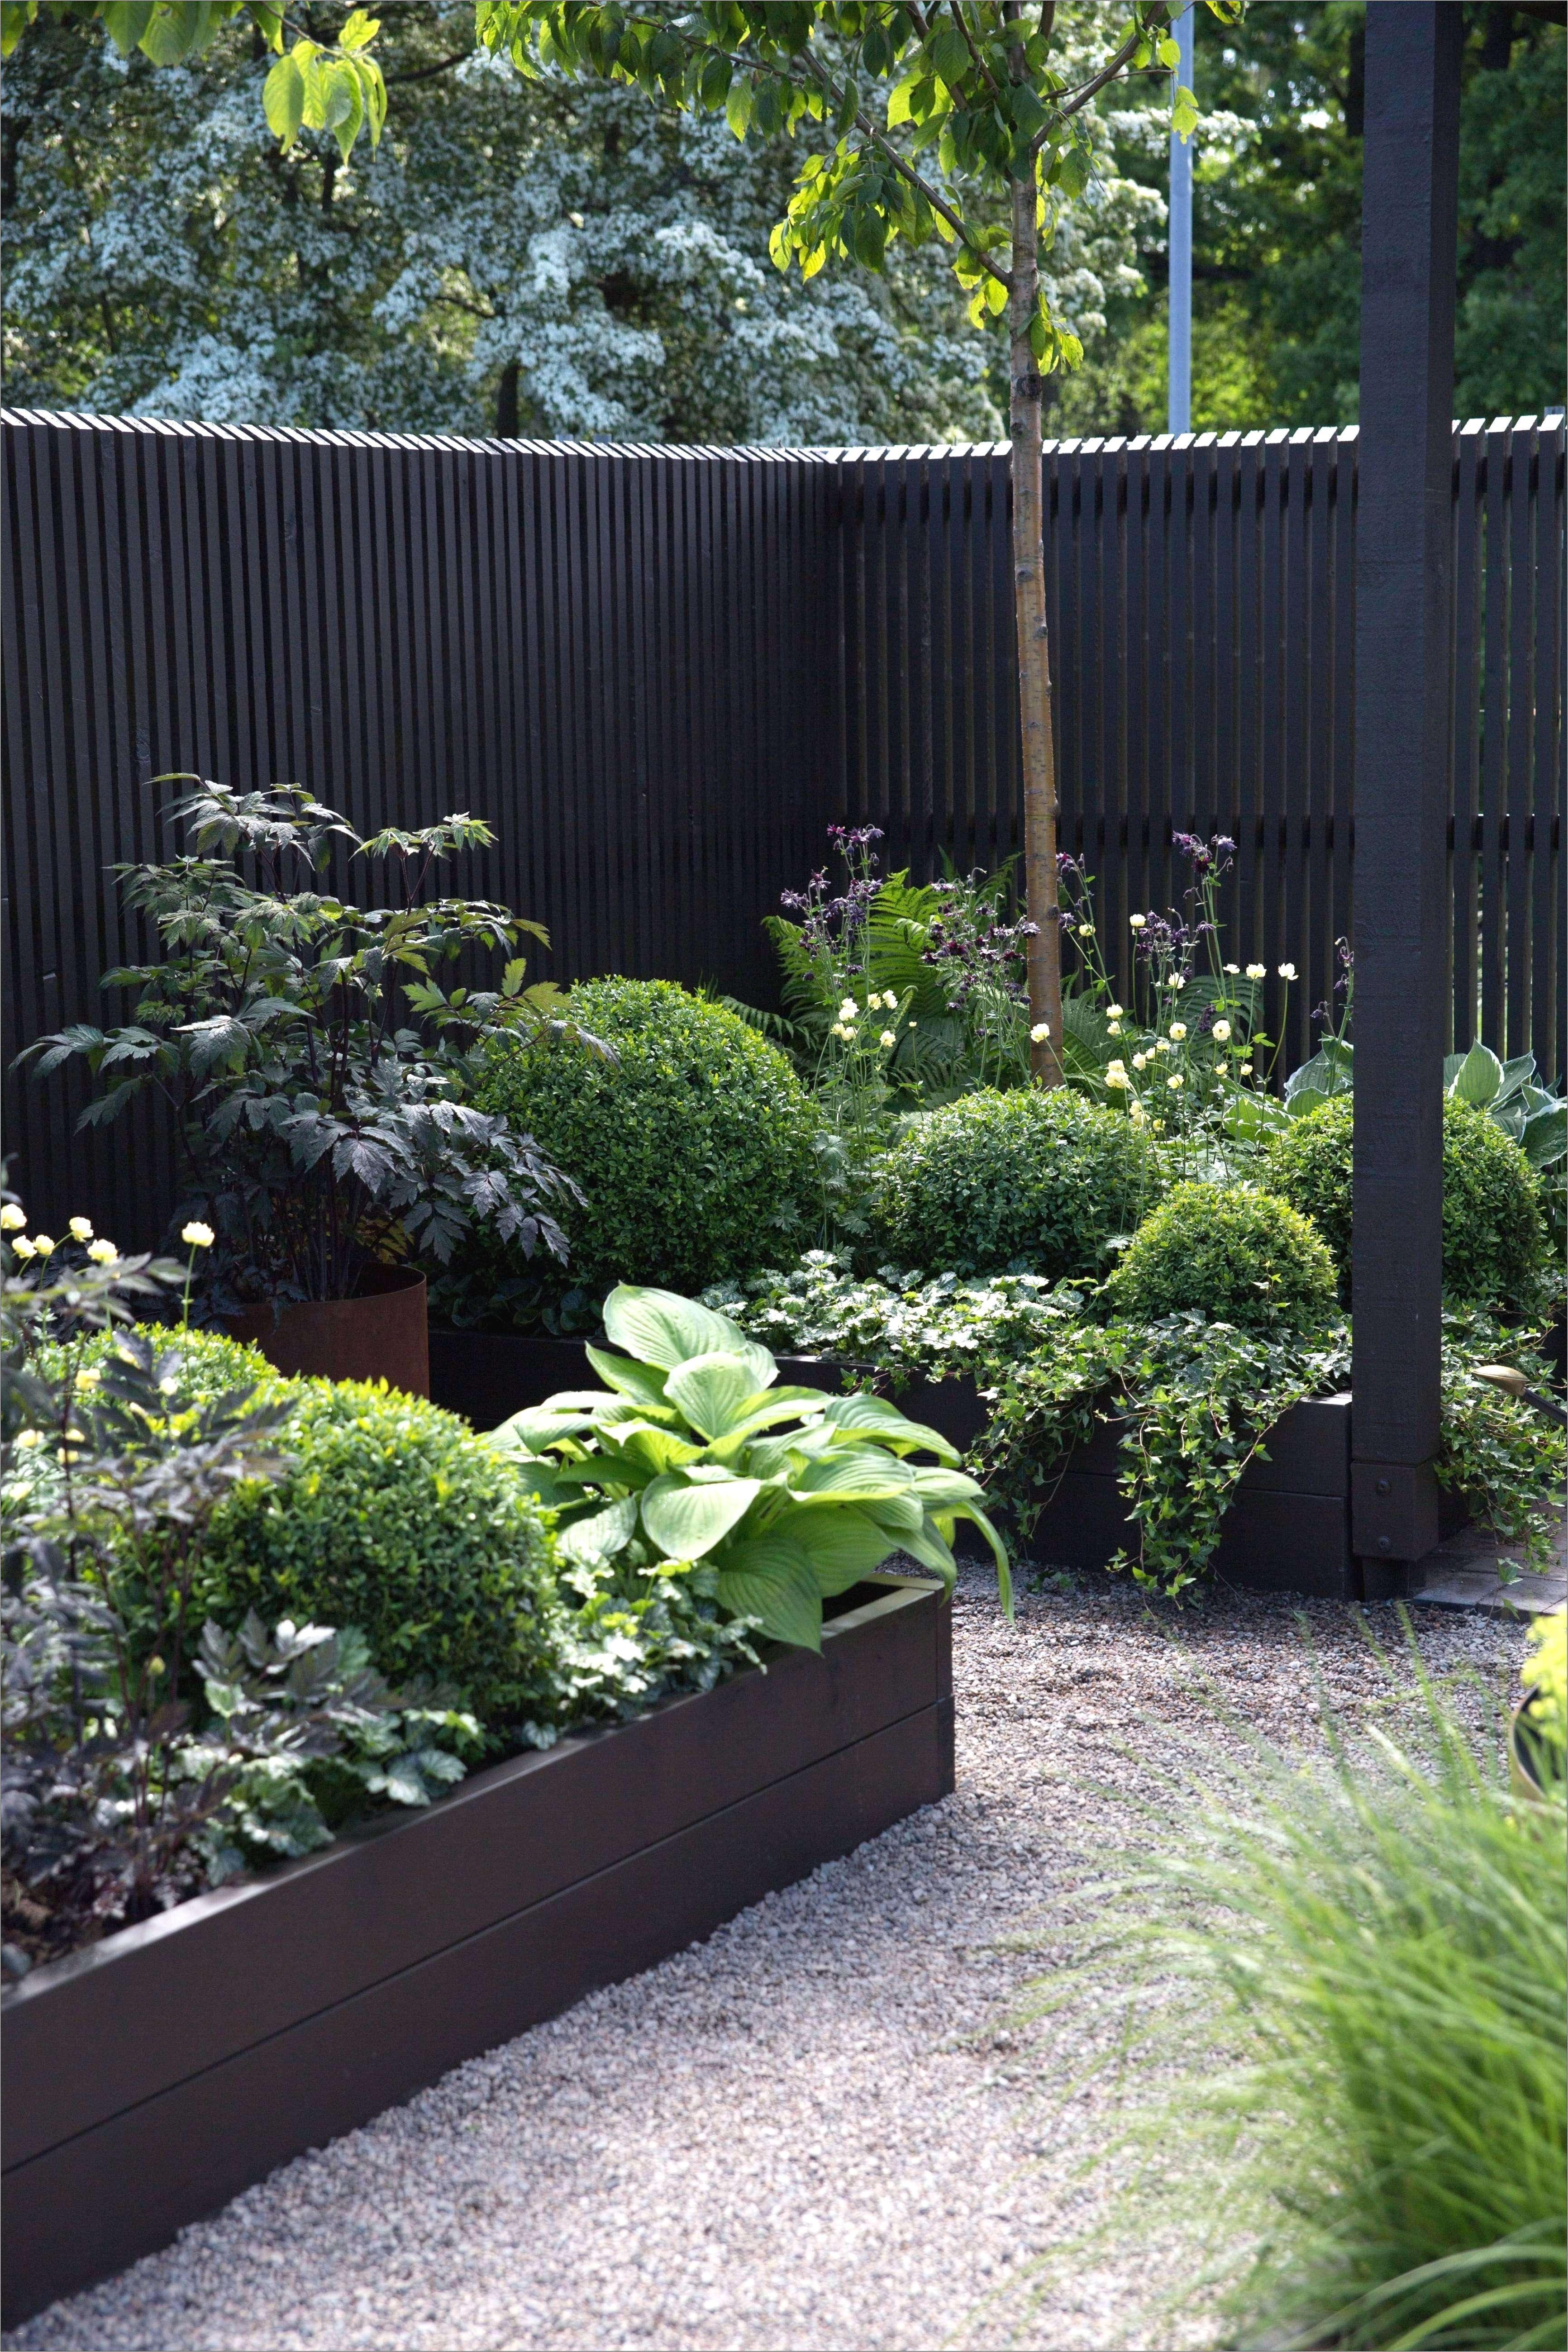 backyard makeover contest 2017 lovely how to design a backyard landscape unique new backyard ideas garden